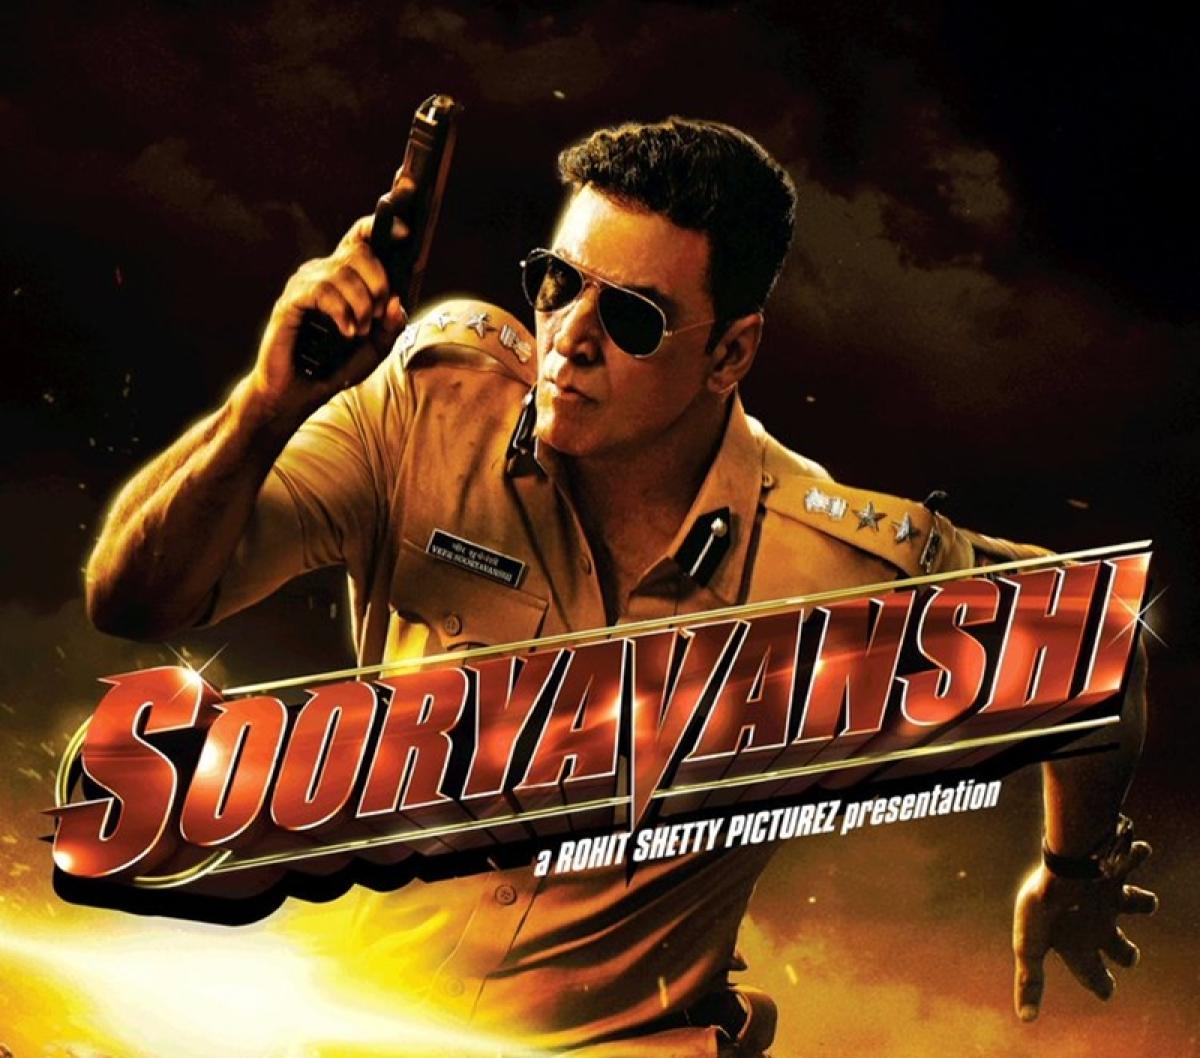 Akshay Kumar reveals the first look of Rohit Shetty's 'Sooryavanshi'